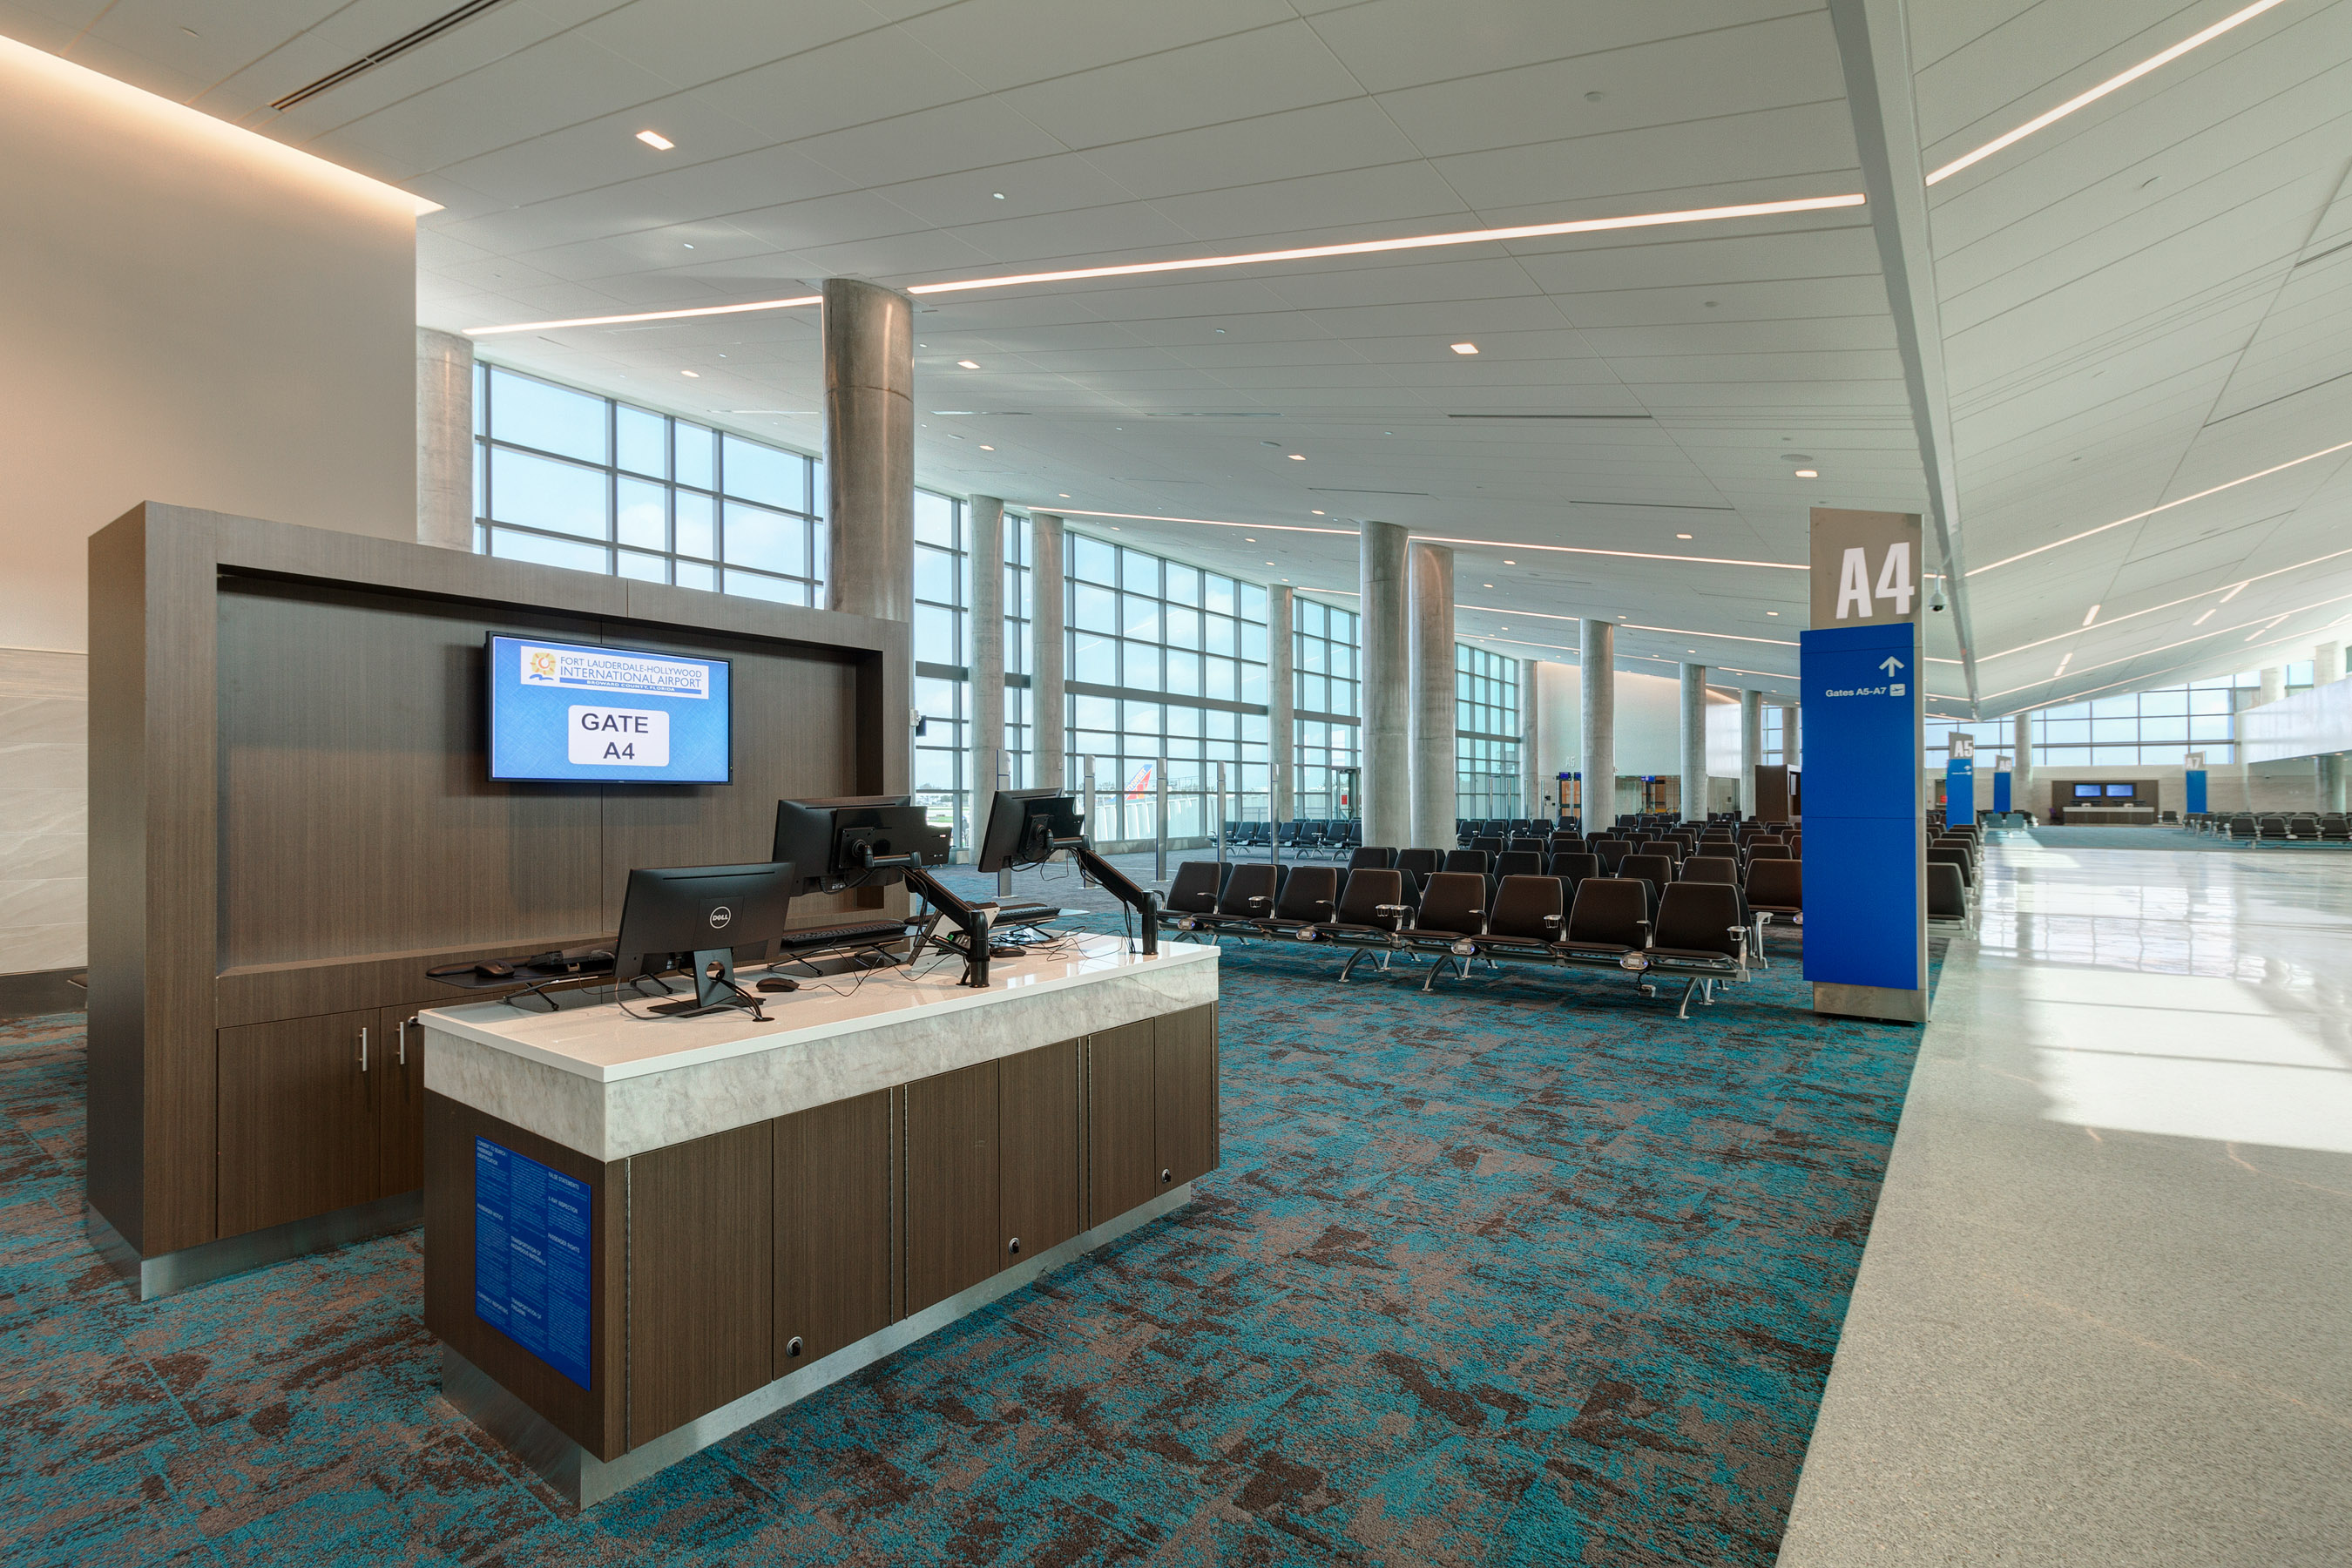 Ft. Lauderdale International Airport 4